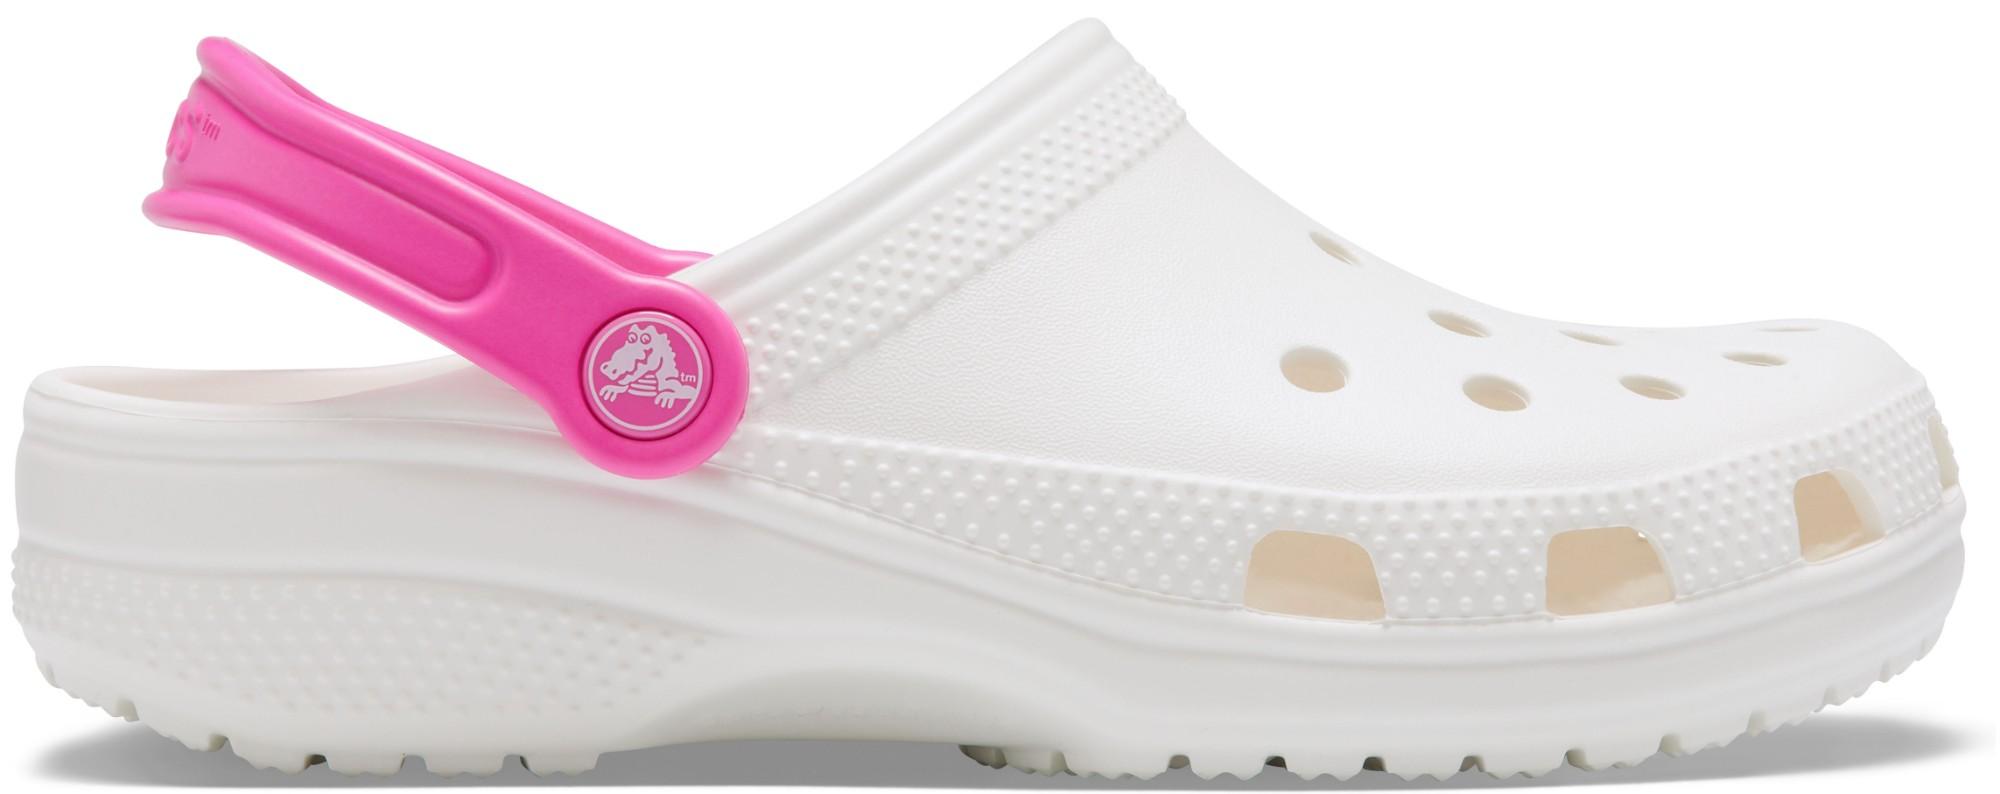 Crocs™ Classic Pop Strap Clog White/Electric Pink 39,5